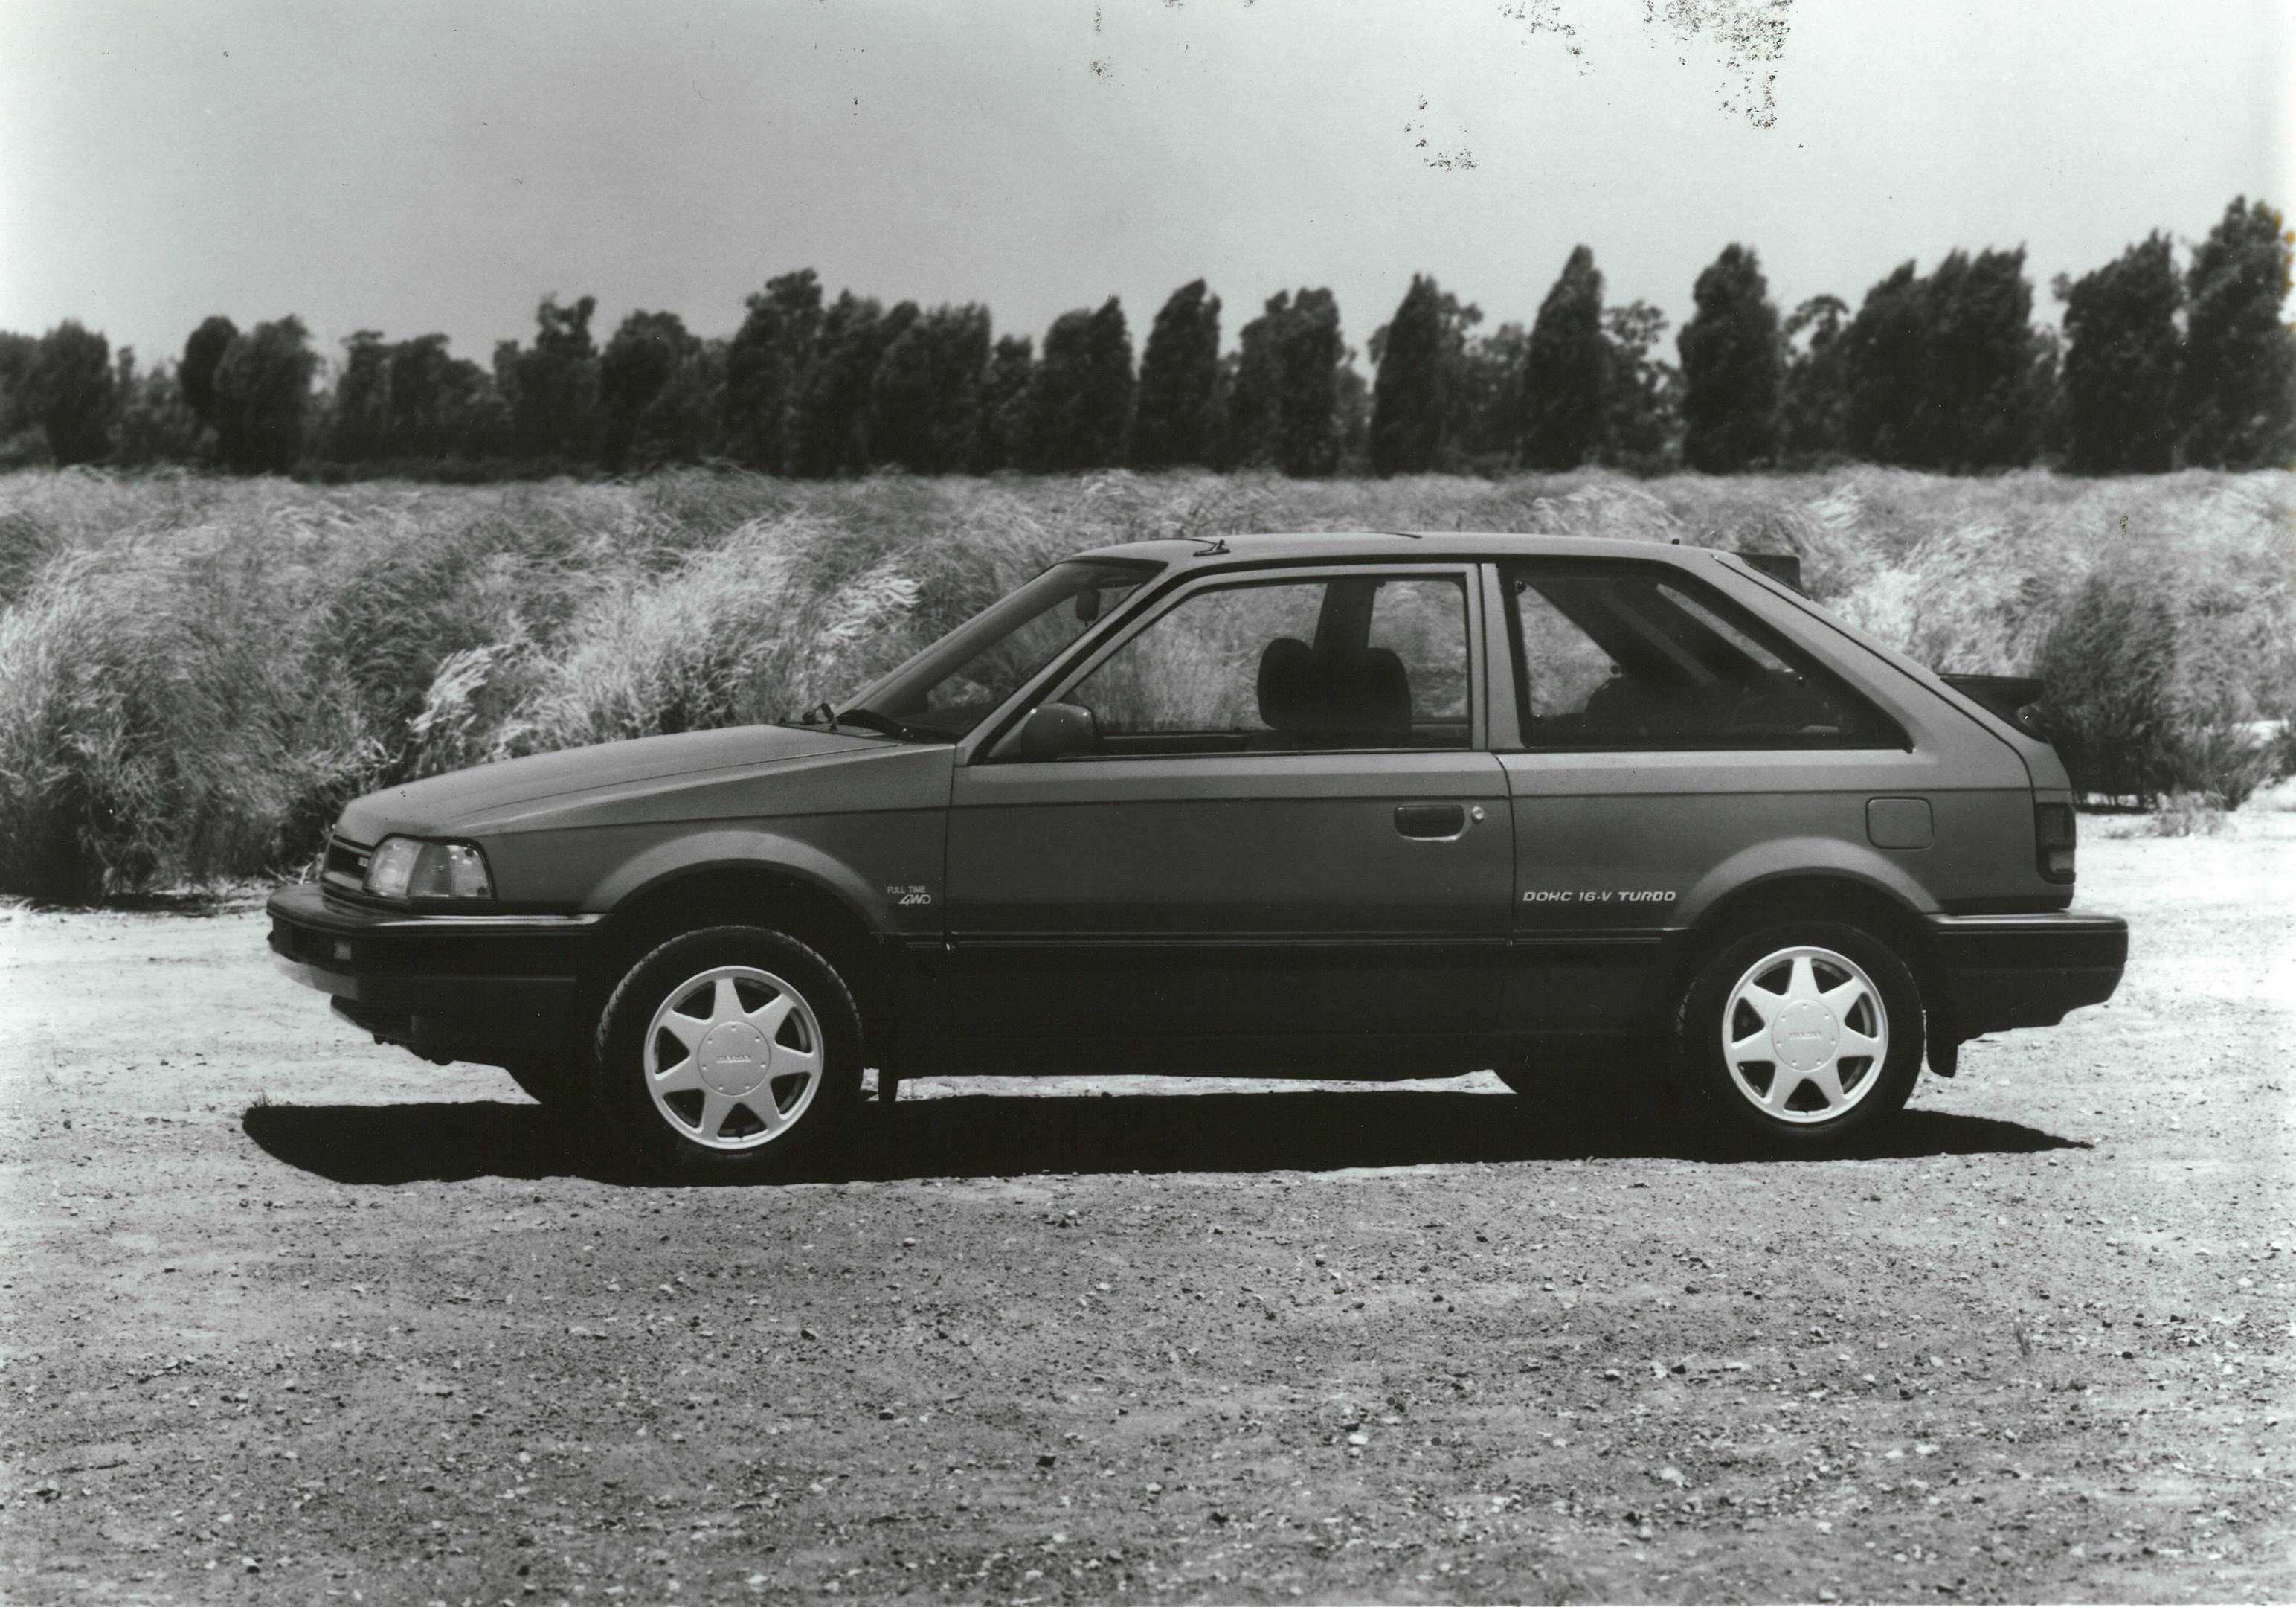 1988 Mazda 323 GTX profile